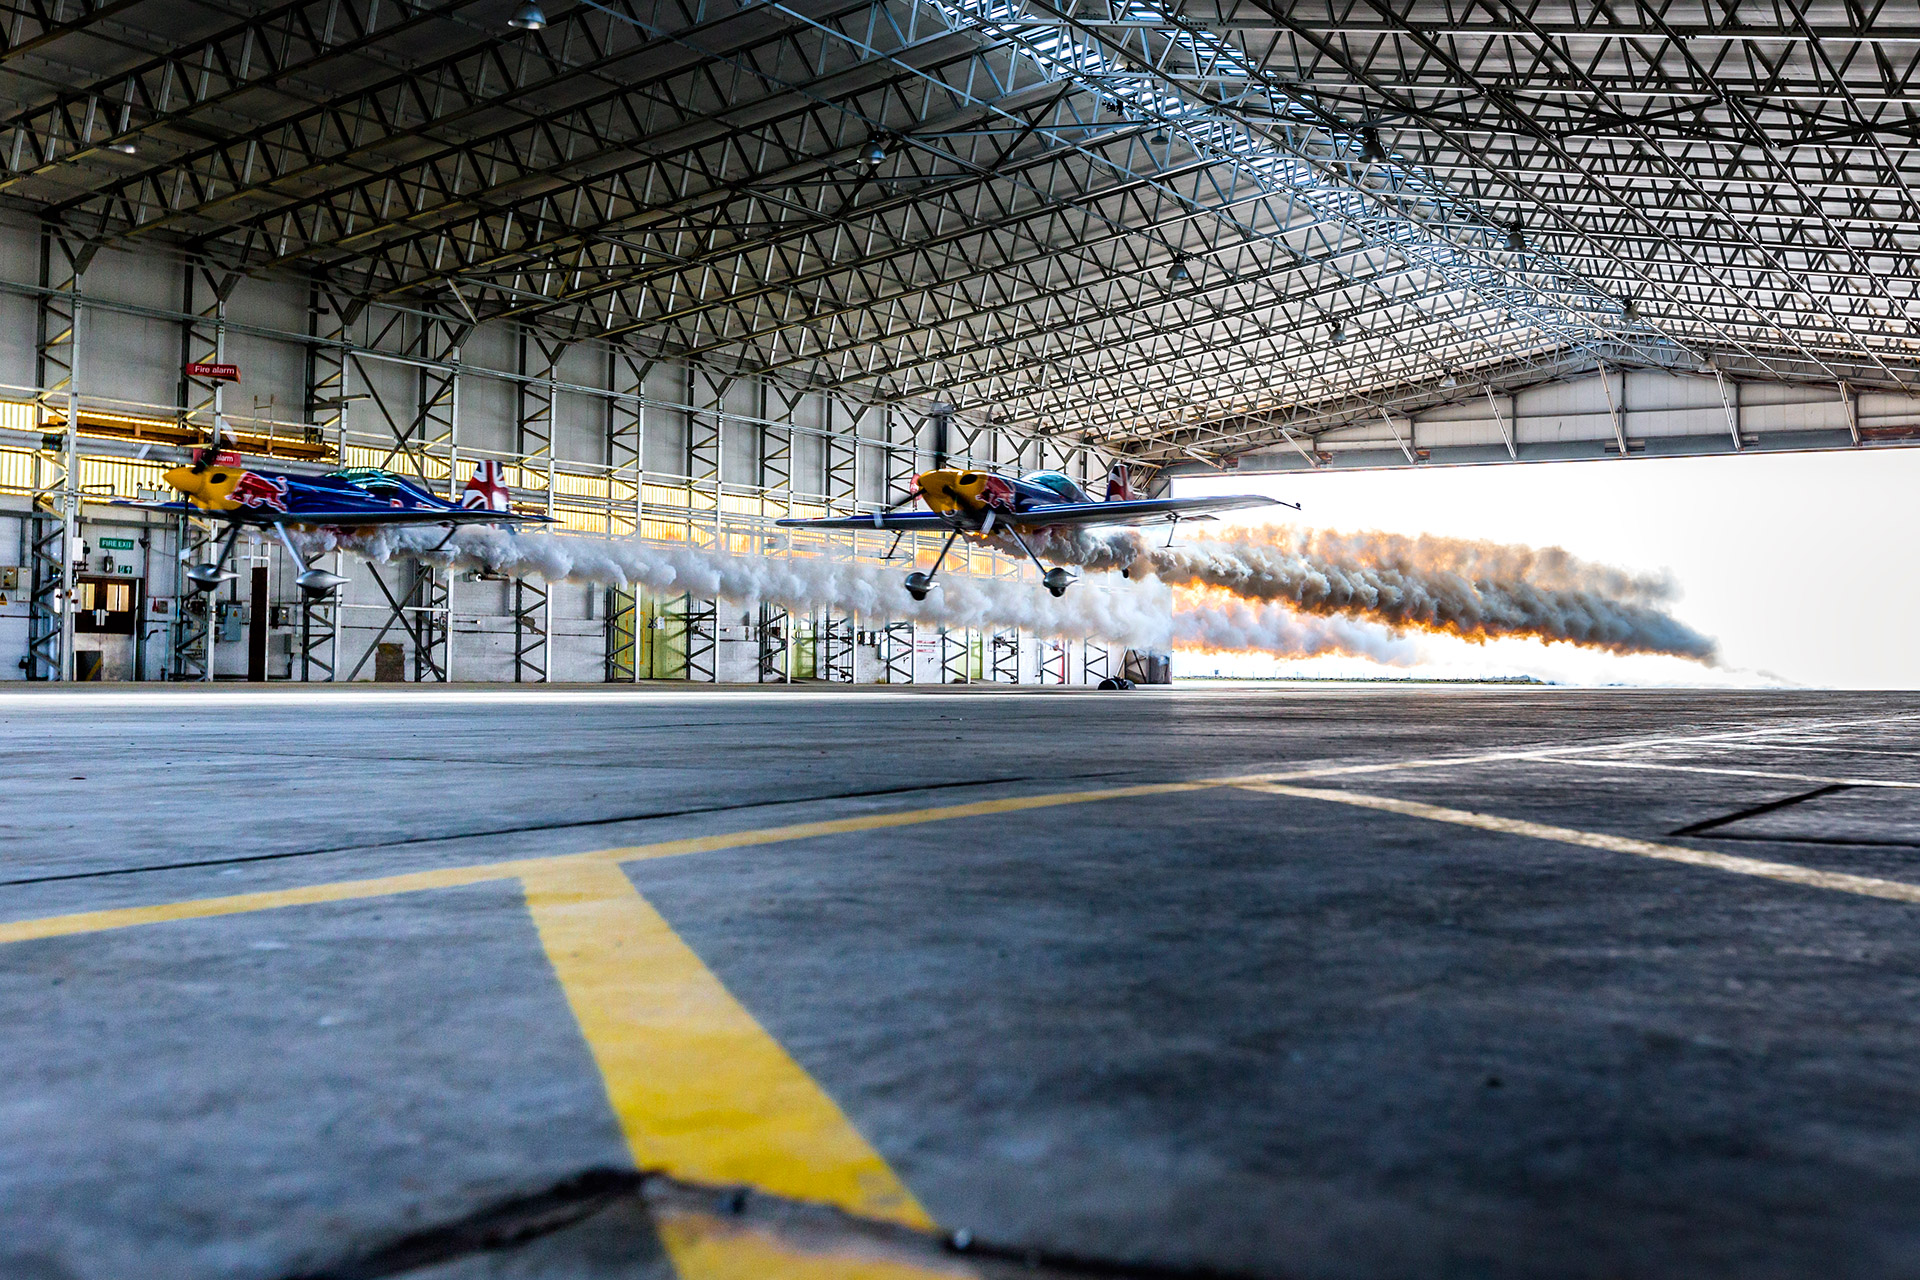 Formation Hangar Fly-Through